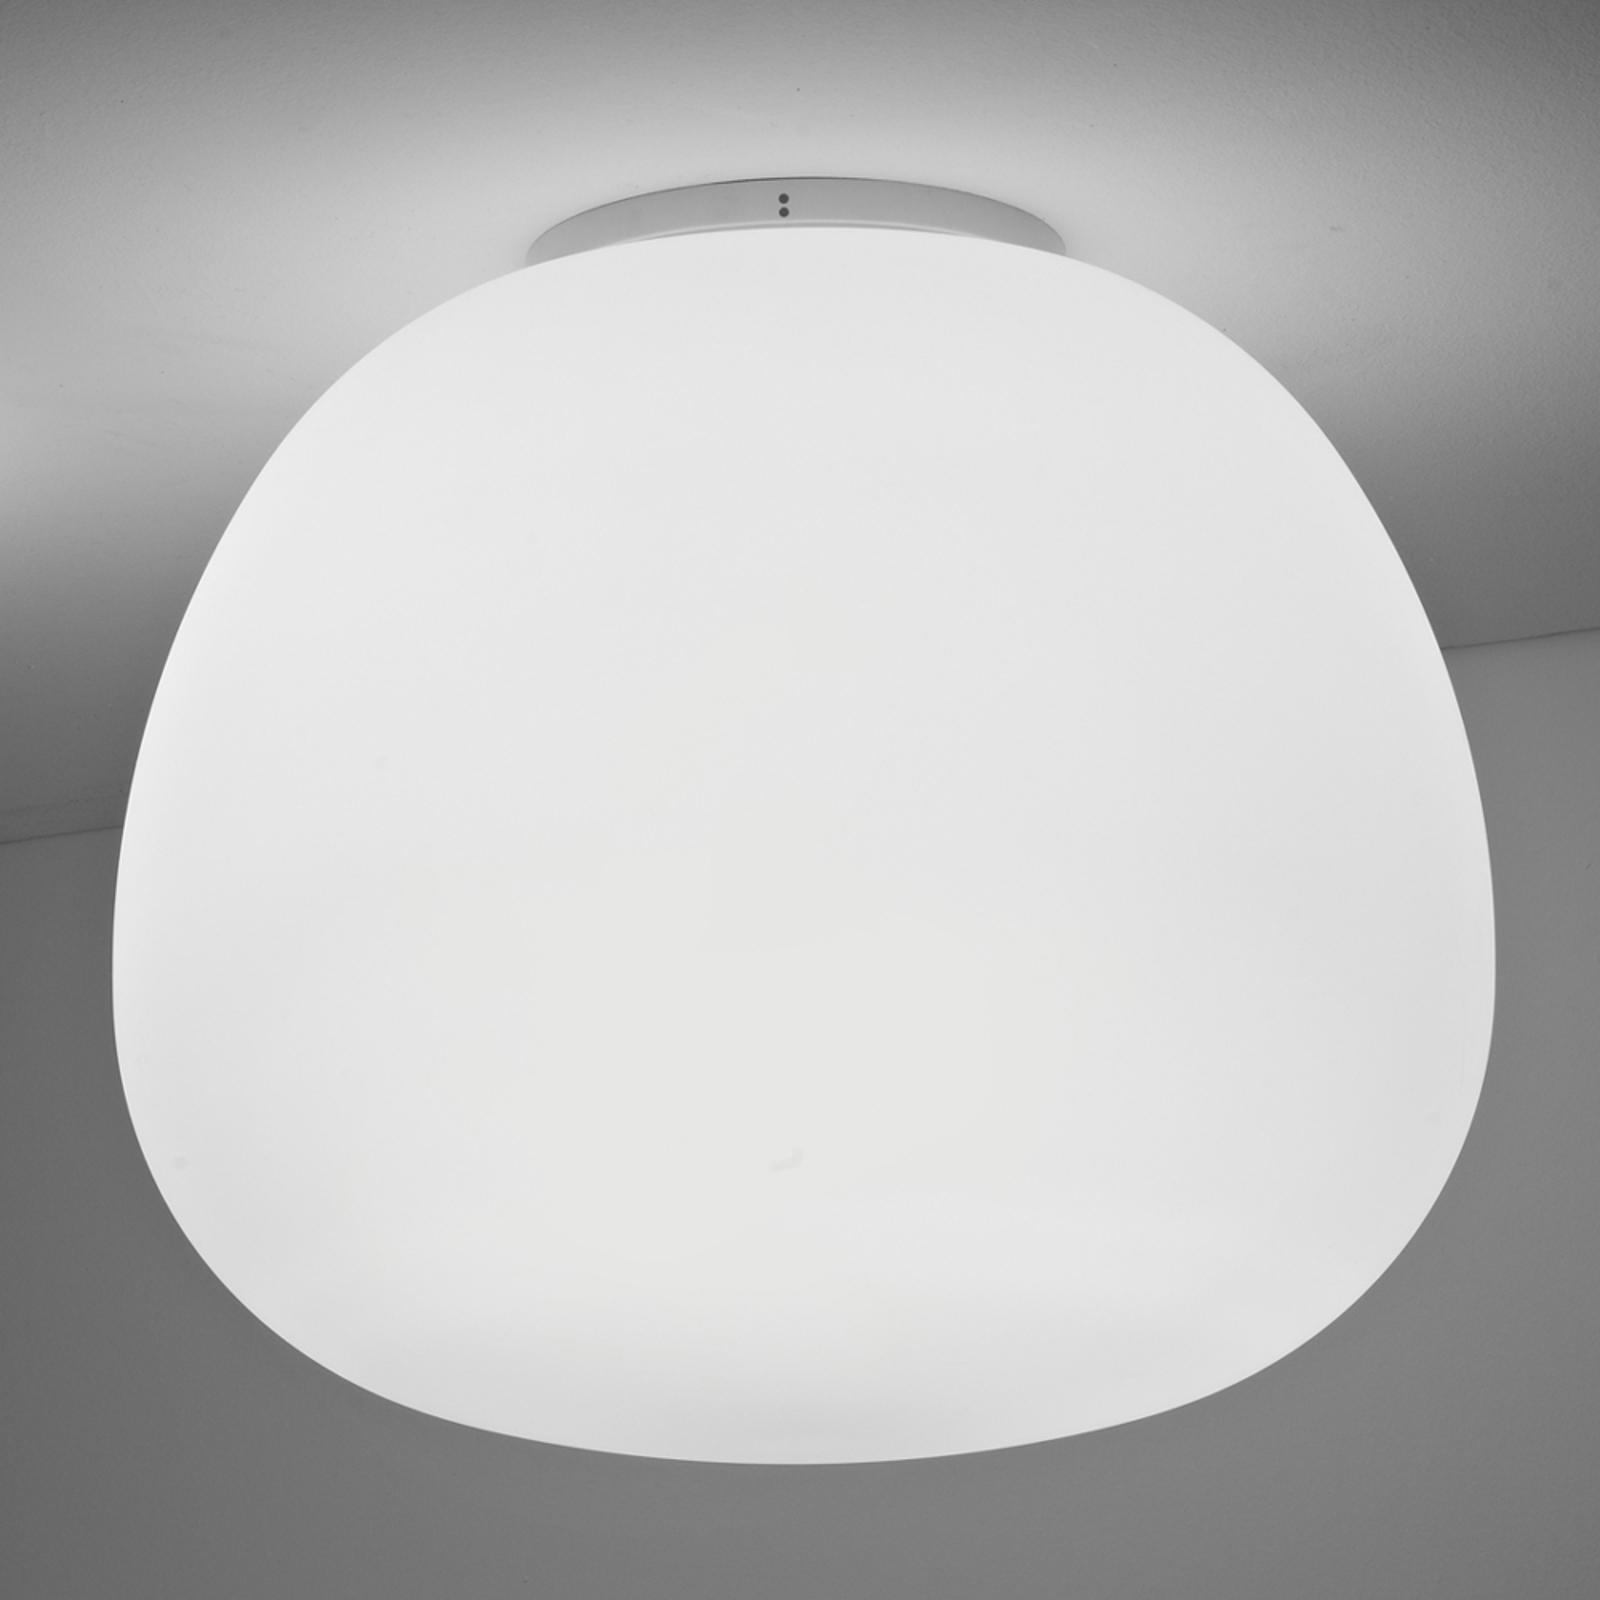 Zacht witte plafondlamp MOCHI diameter 45 cm